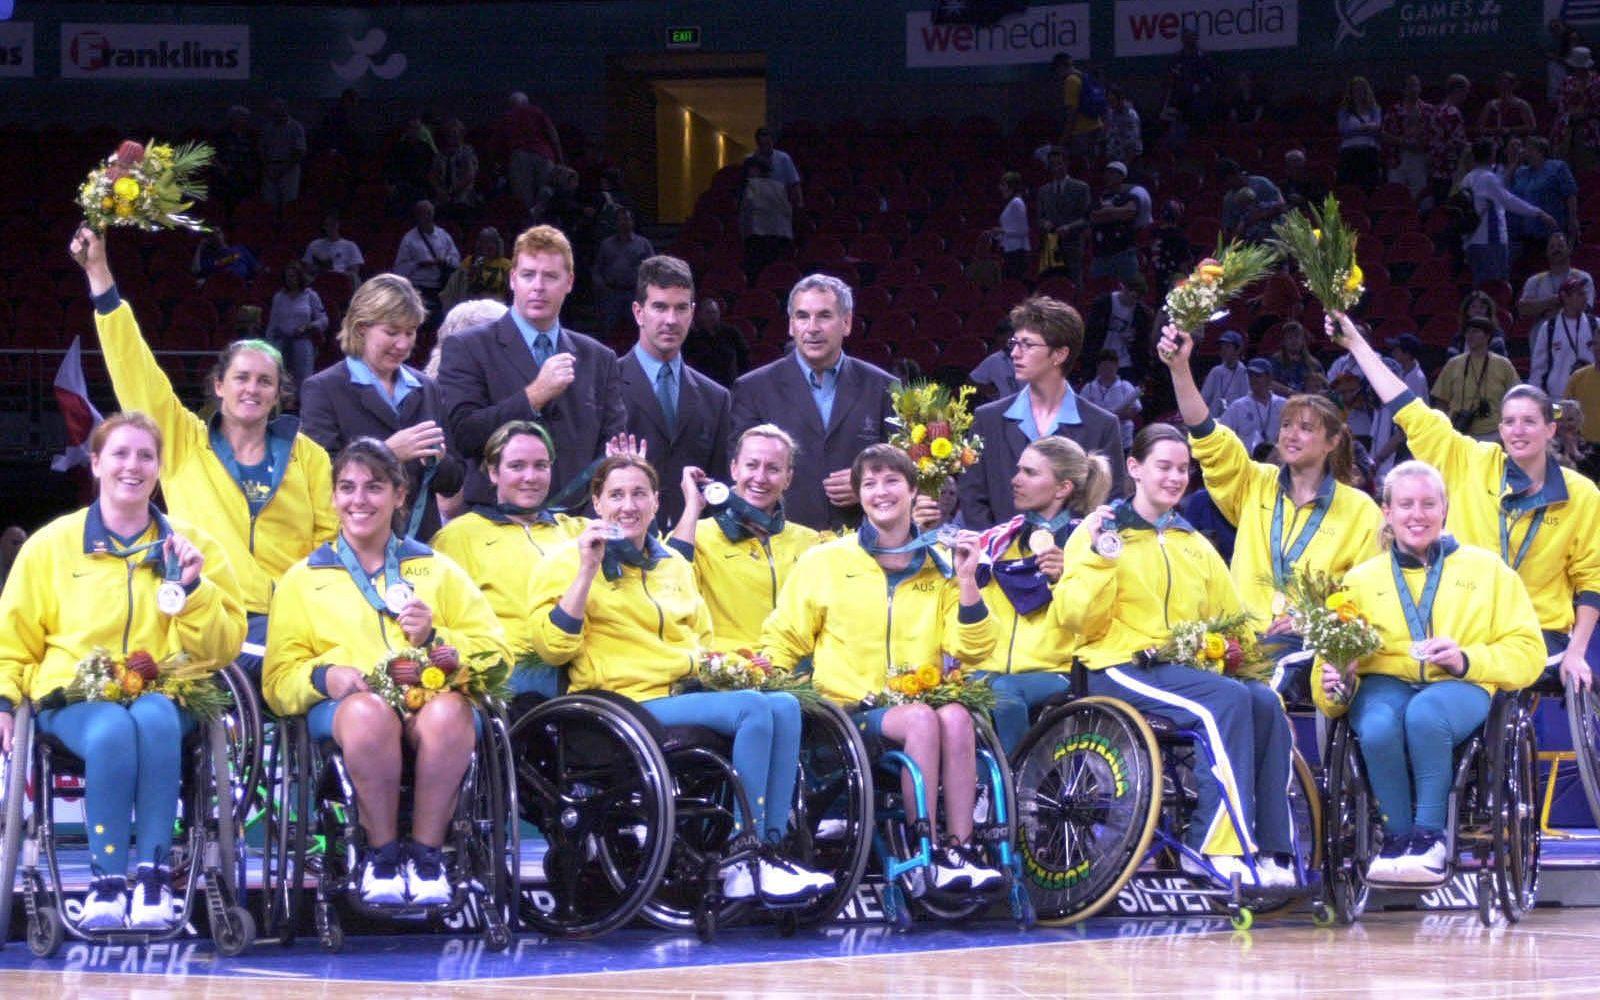 Sydney 2000: Day 9, Tuesday 27 October